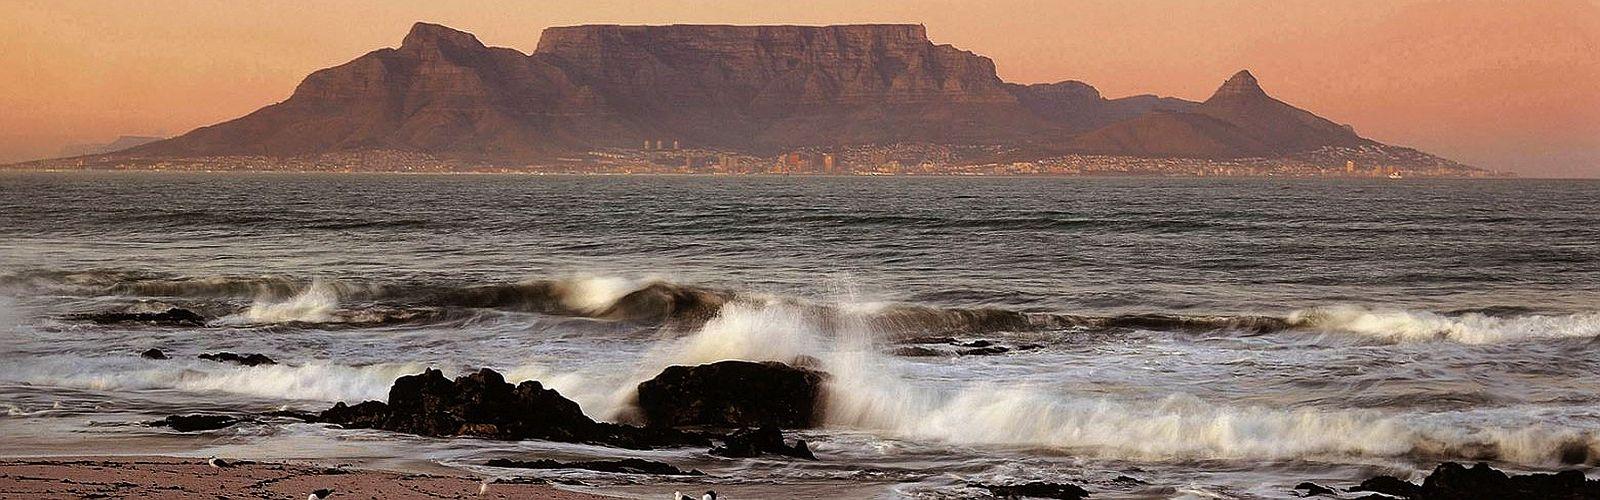 Te doen in Kaapstad